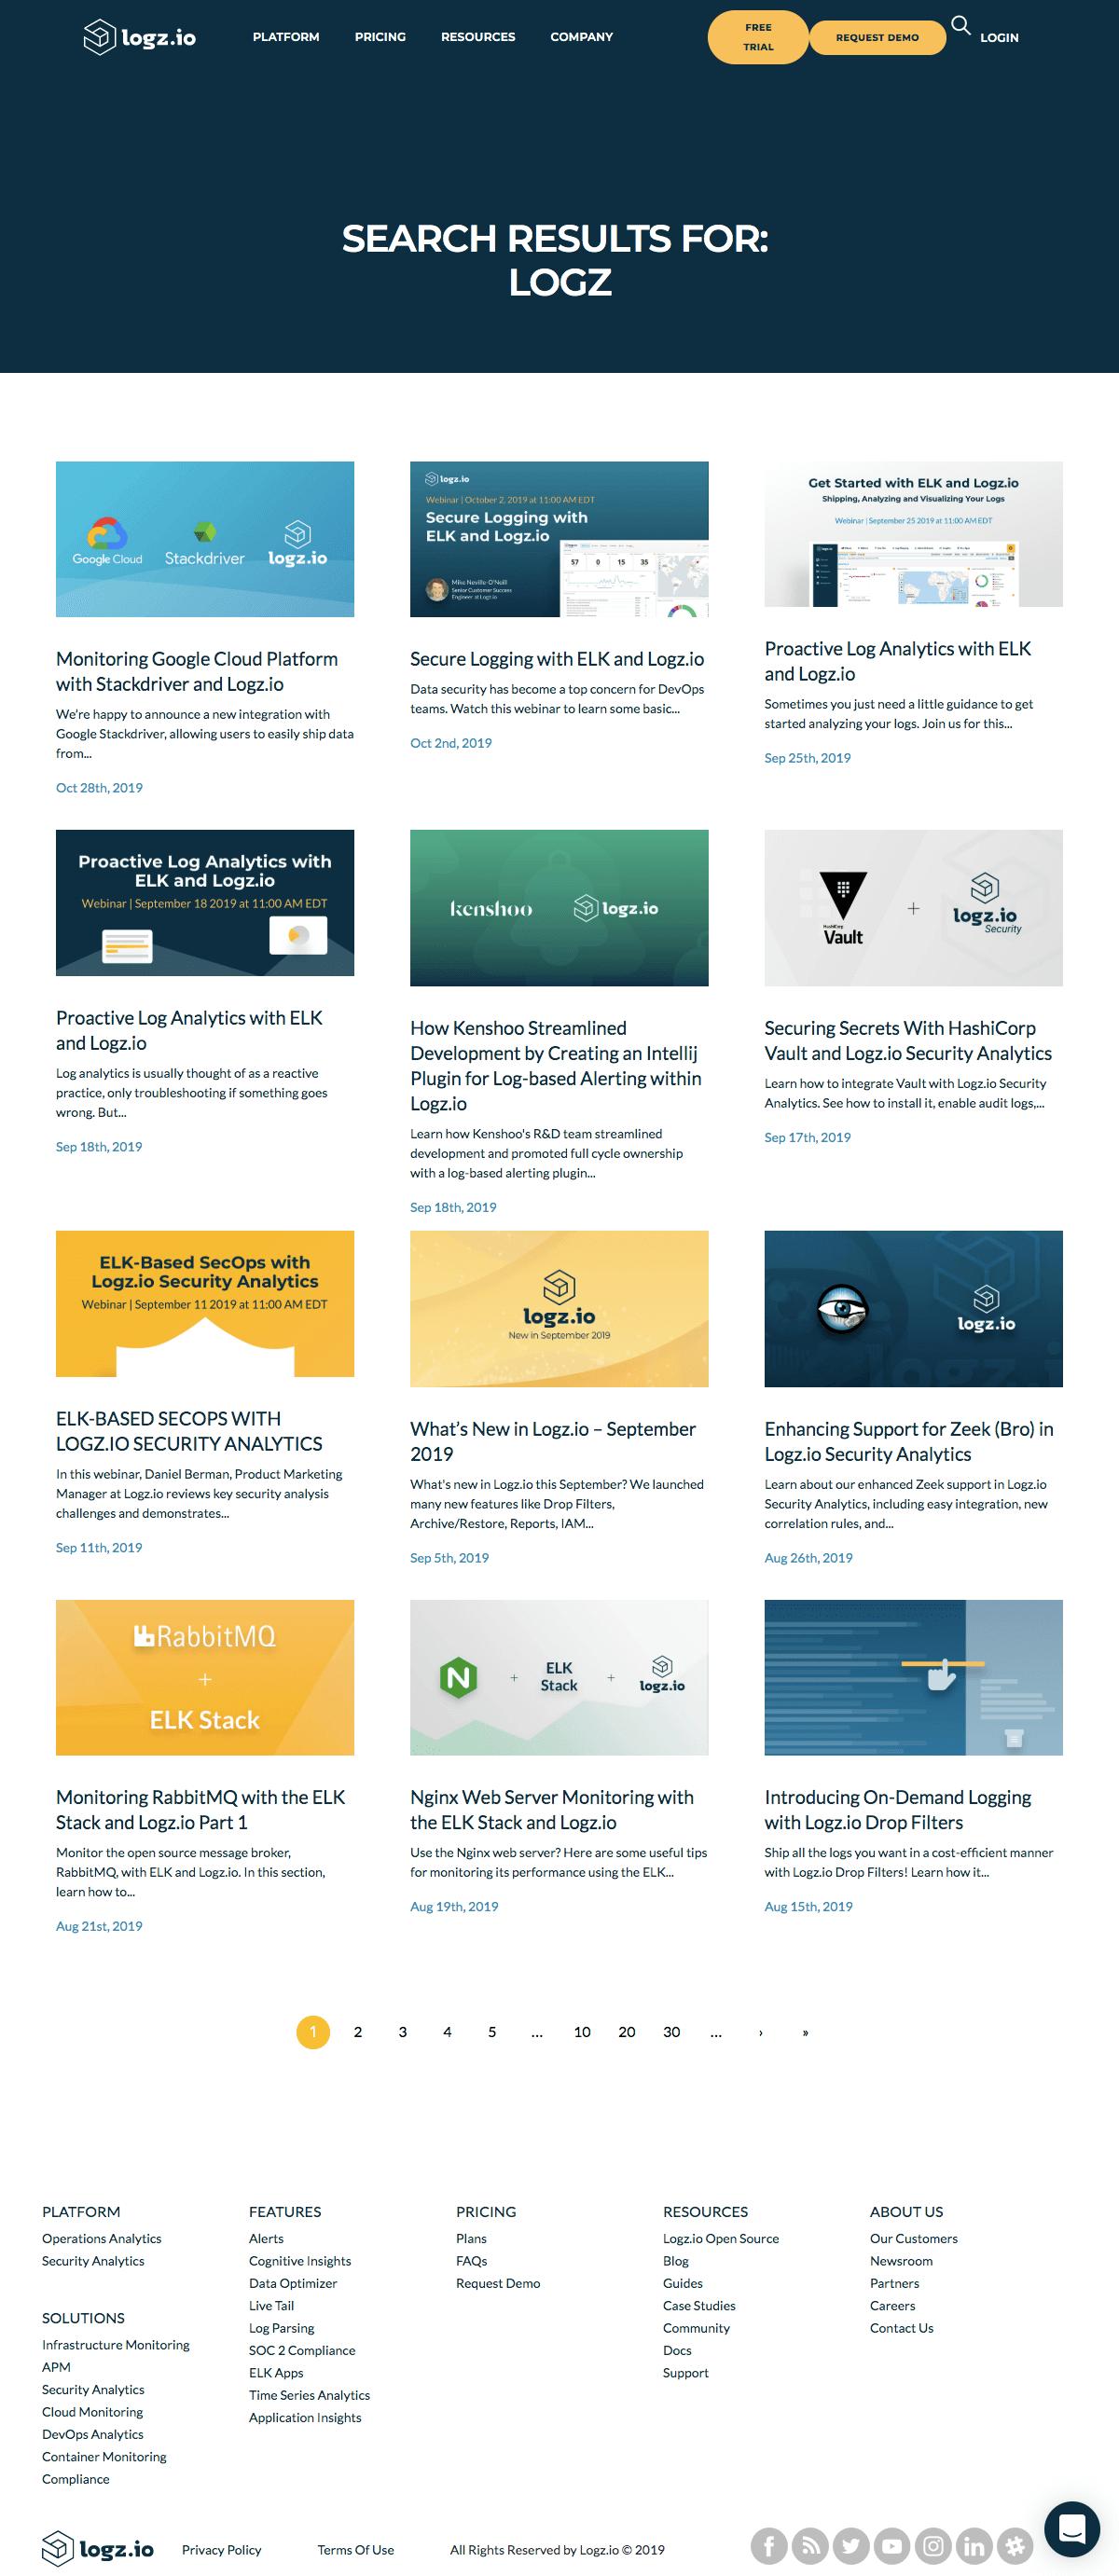 Logz.io - Search results page